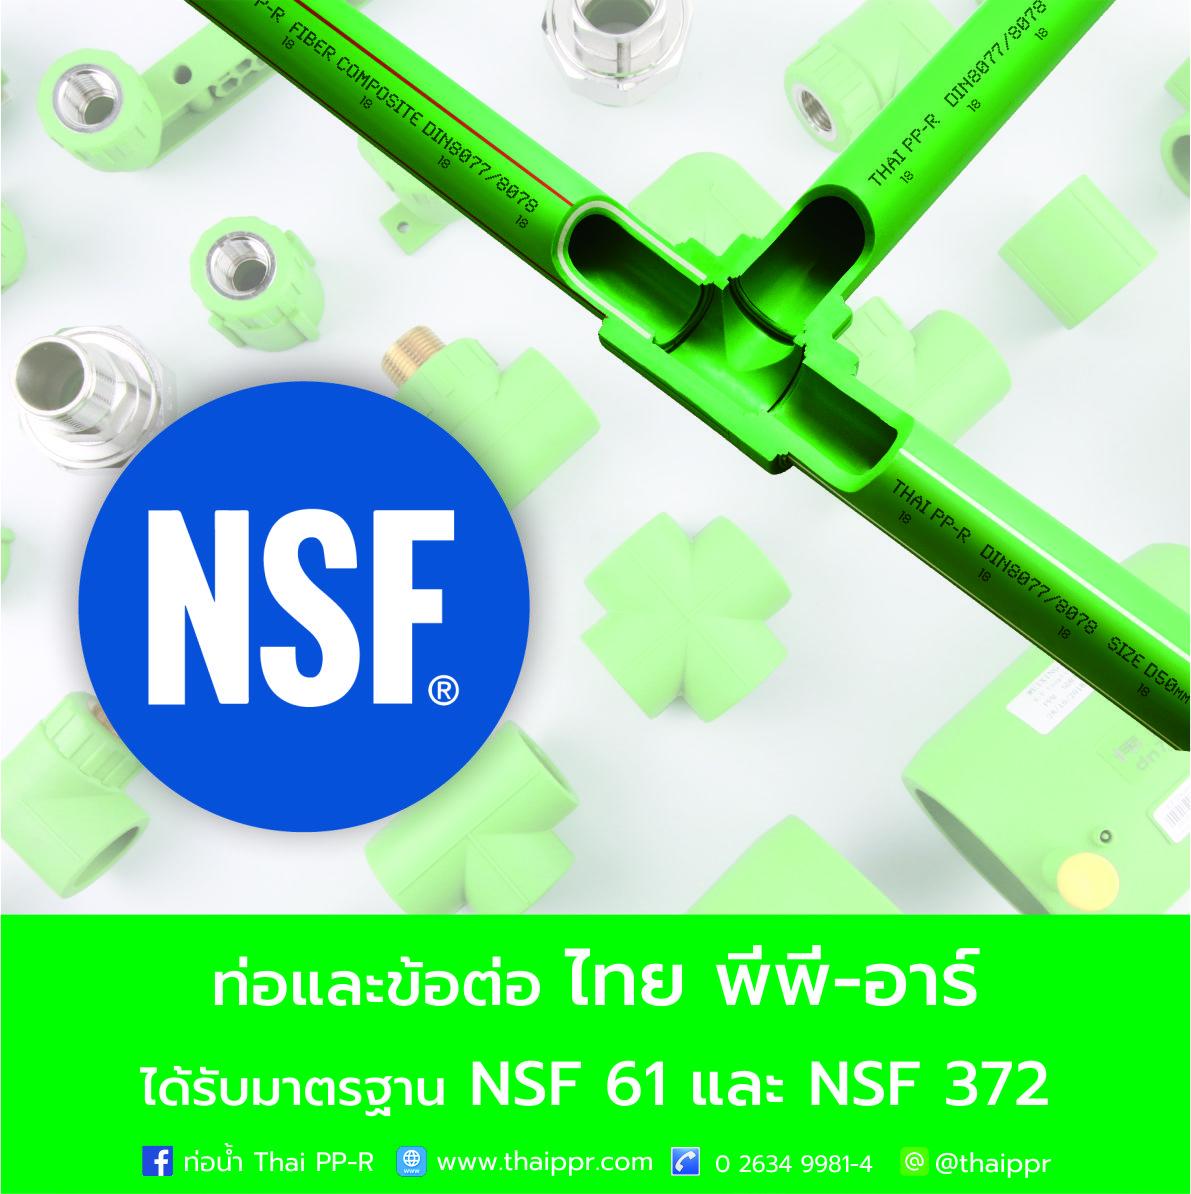 Thai PPR ได้มาตรฐาน NFS